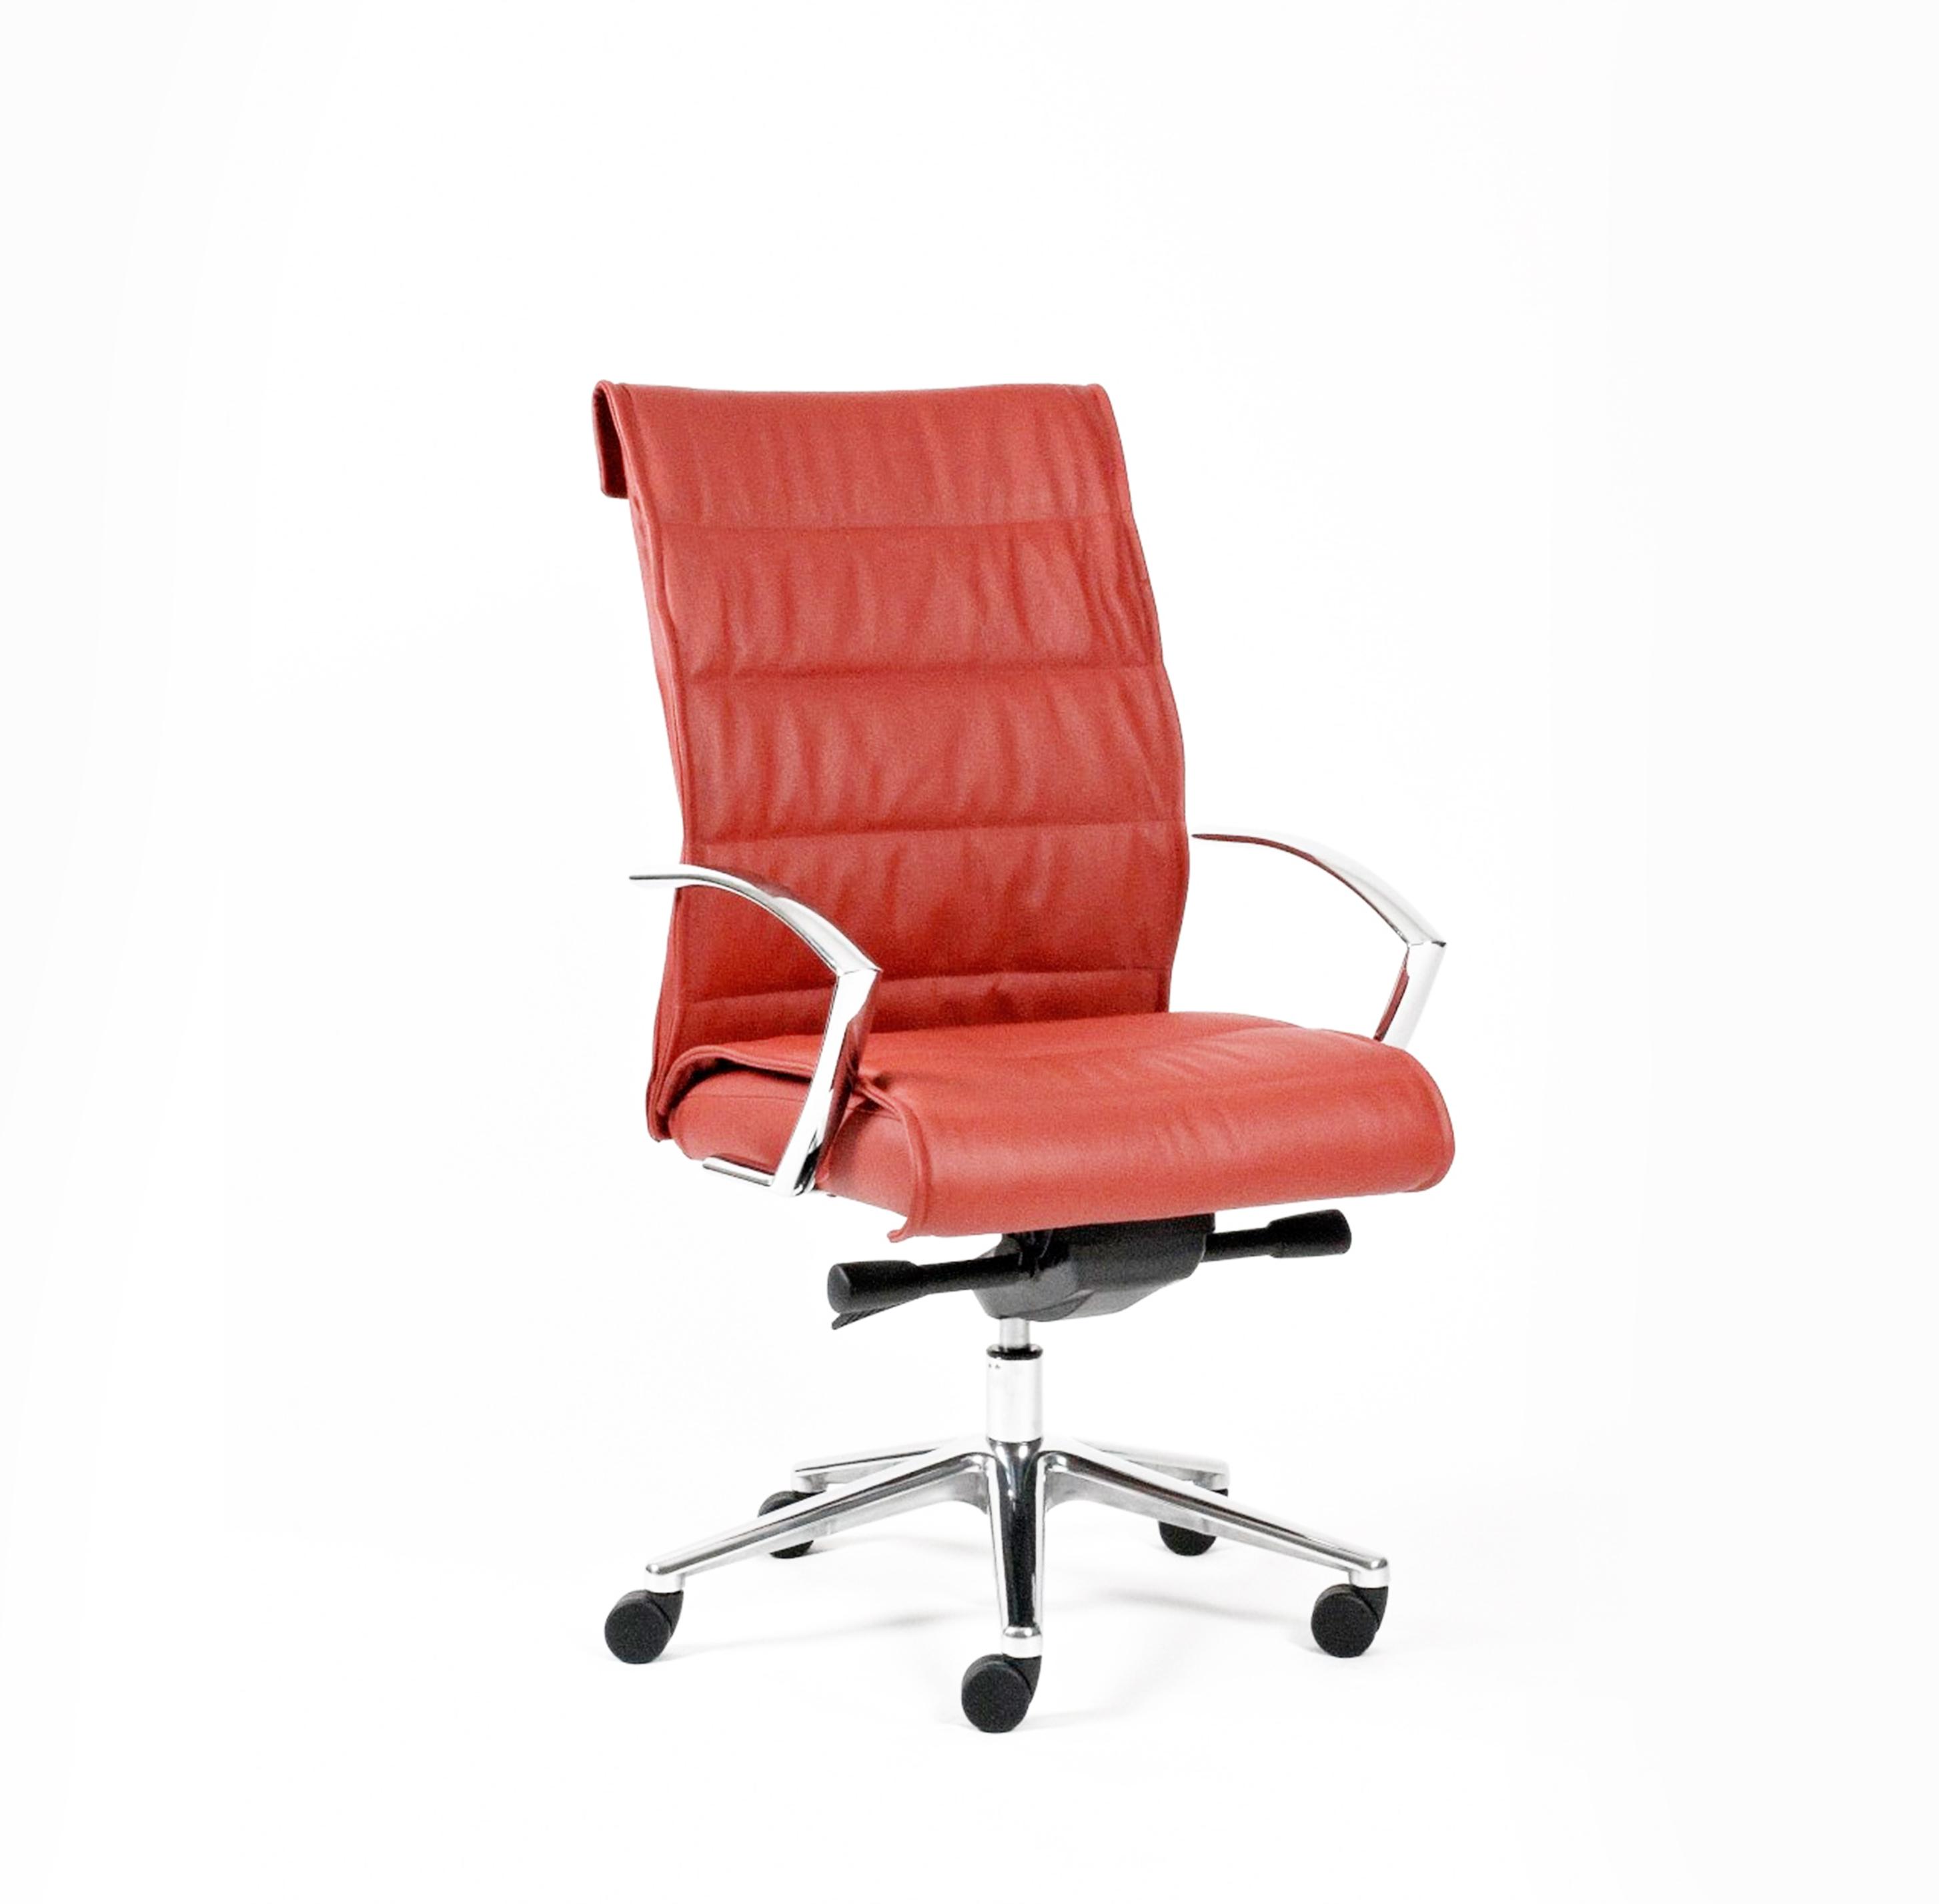 Signet Stitched Medium Back Chair